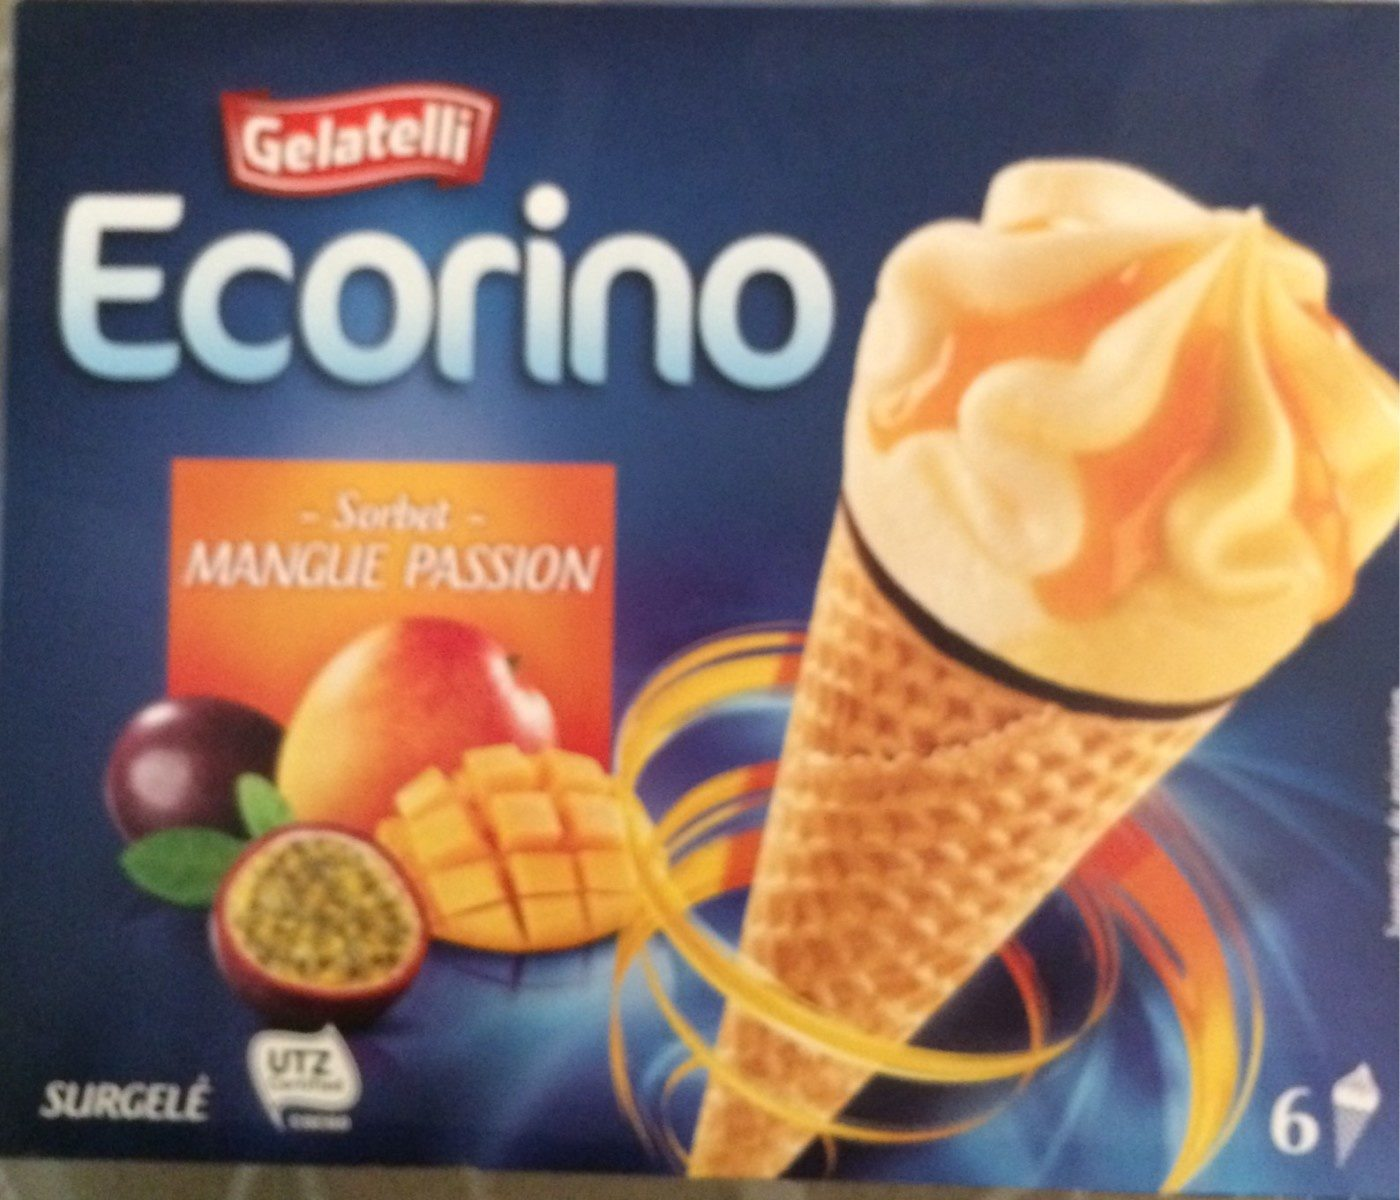 Ecorino mangue passion - Produit - fr